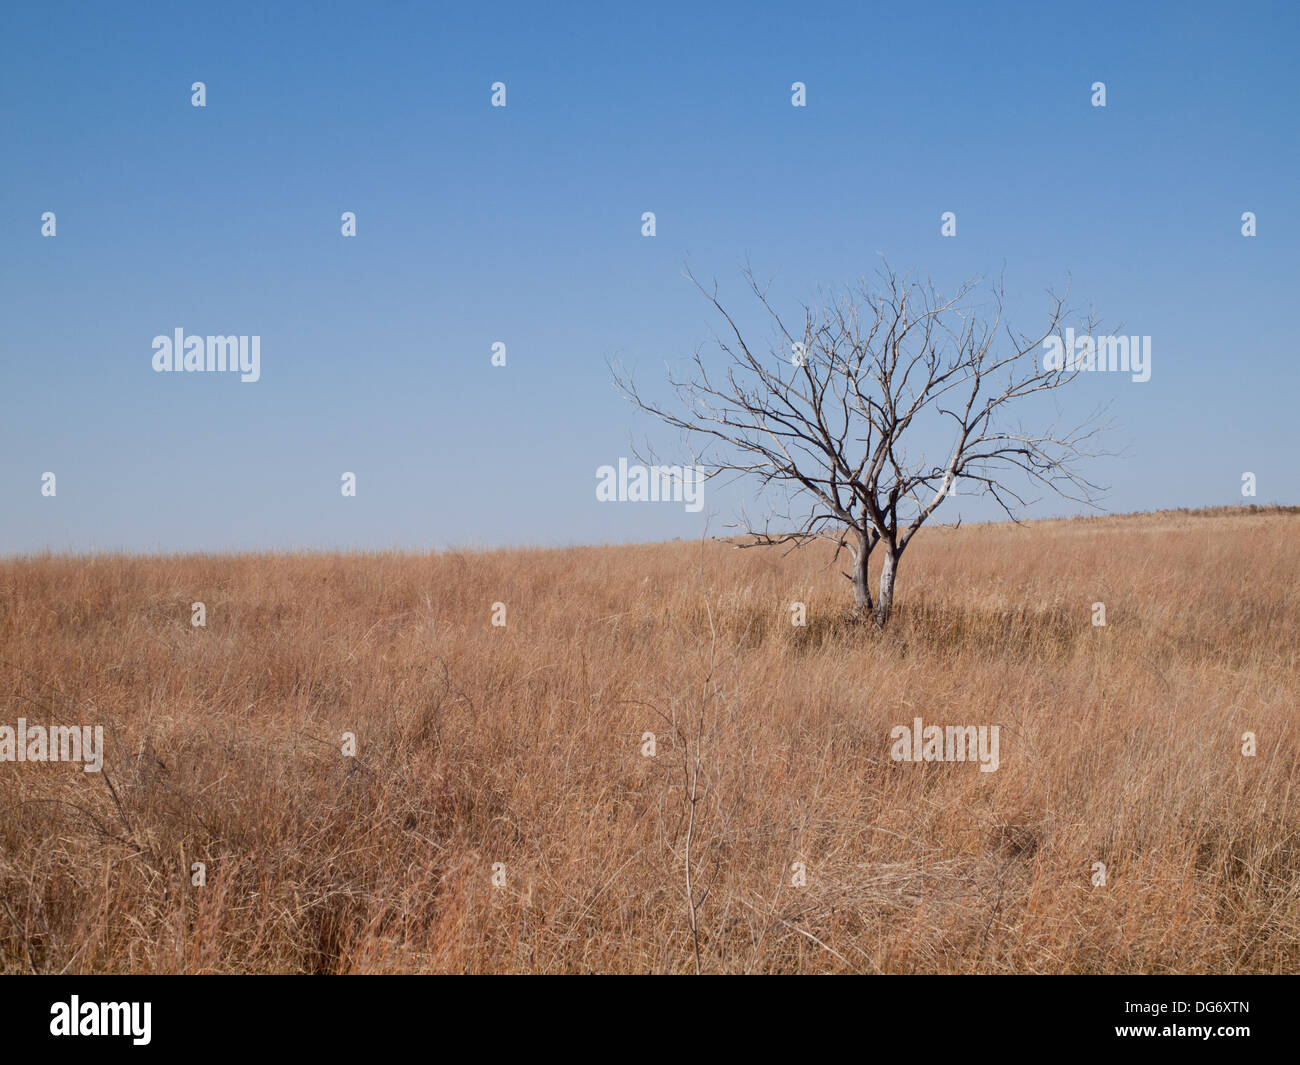 Natural prairie grassland landscape at Beaver Creek Conservation Area near Saskatoon, Saskatchewan, Canada. - Stock Image